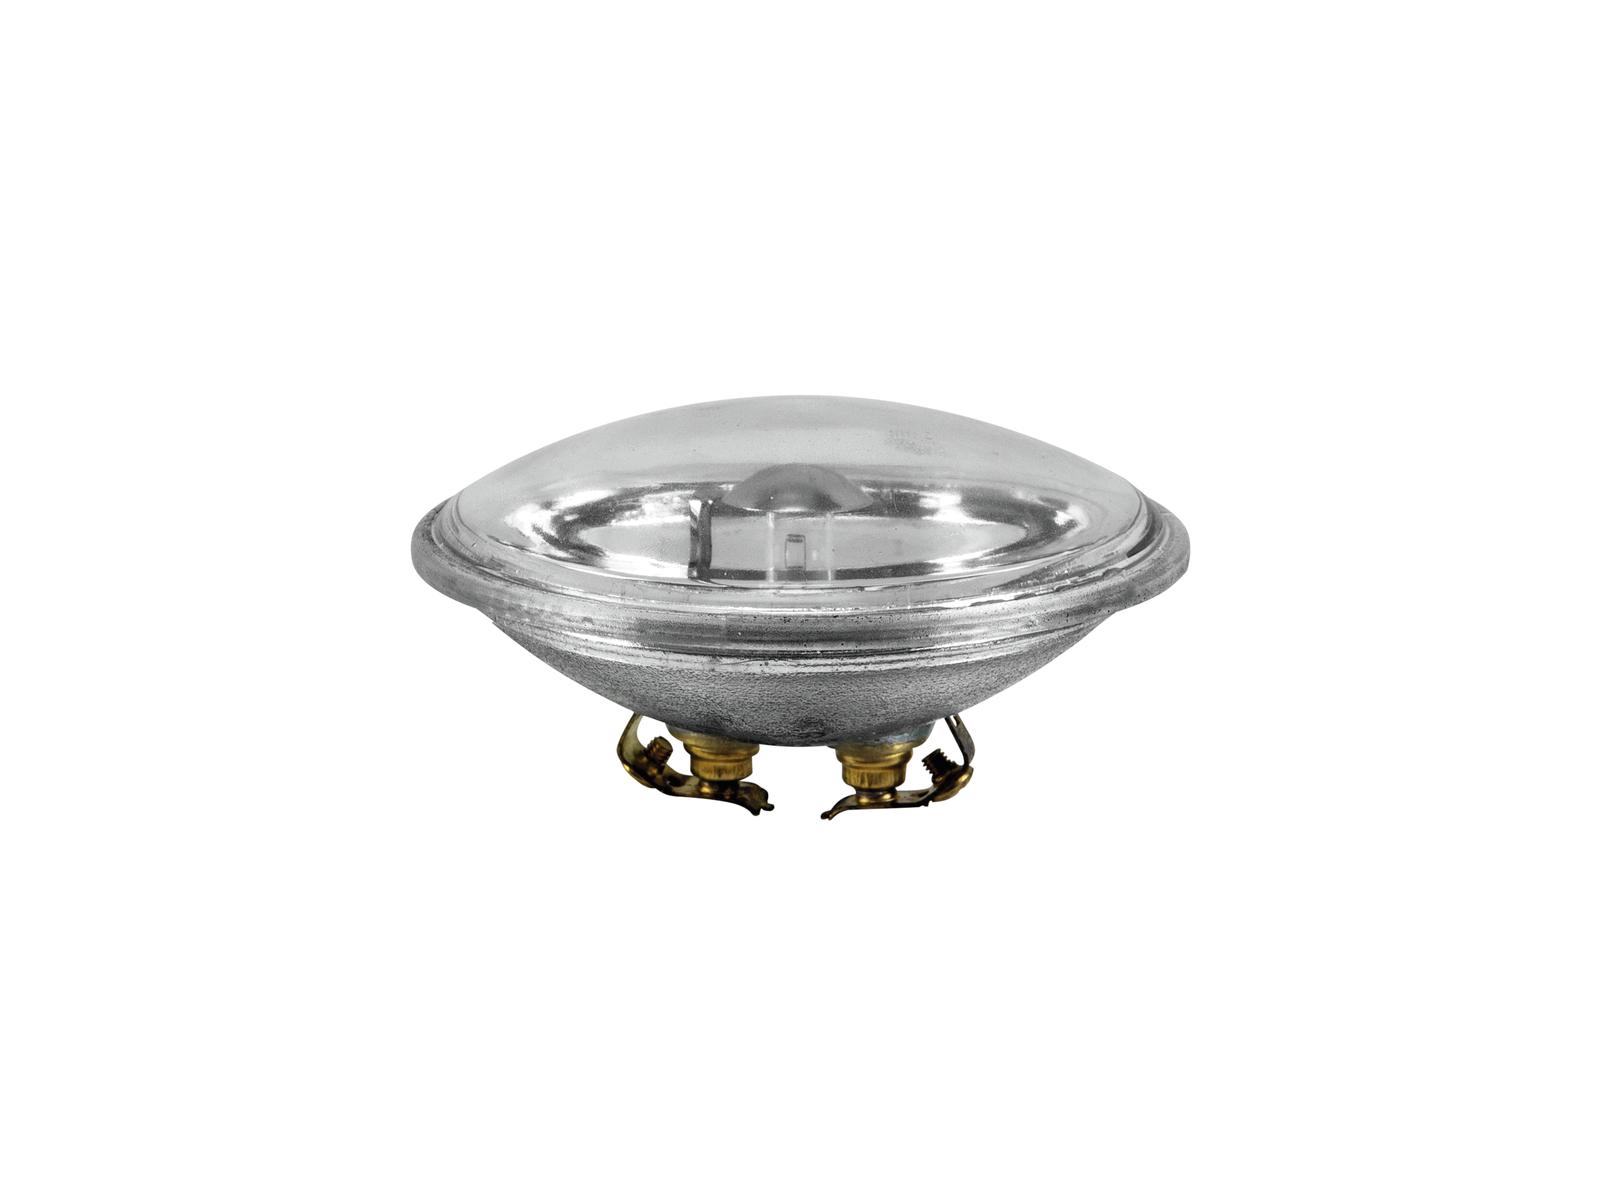 Lampada Faro DI ricambio OMNILUX PAR-36 6.4 V/30W G-53 VNSP verde